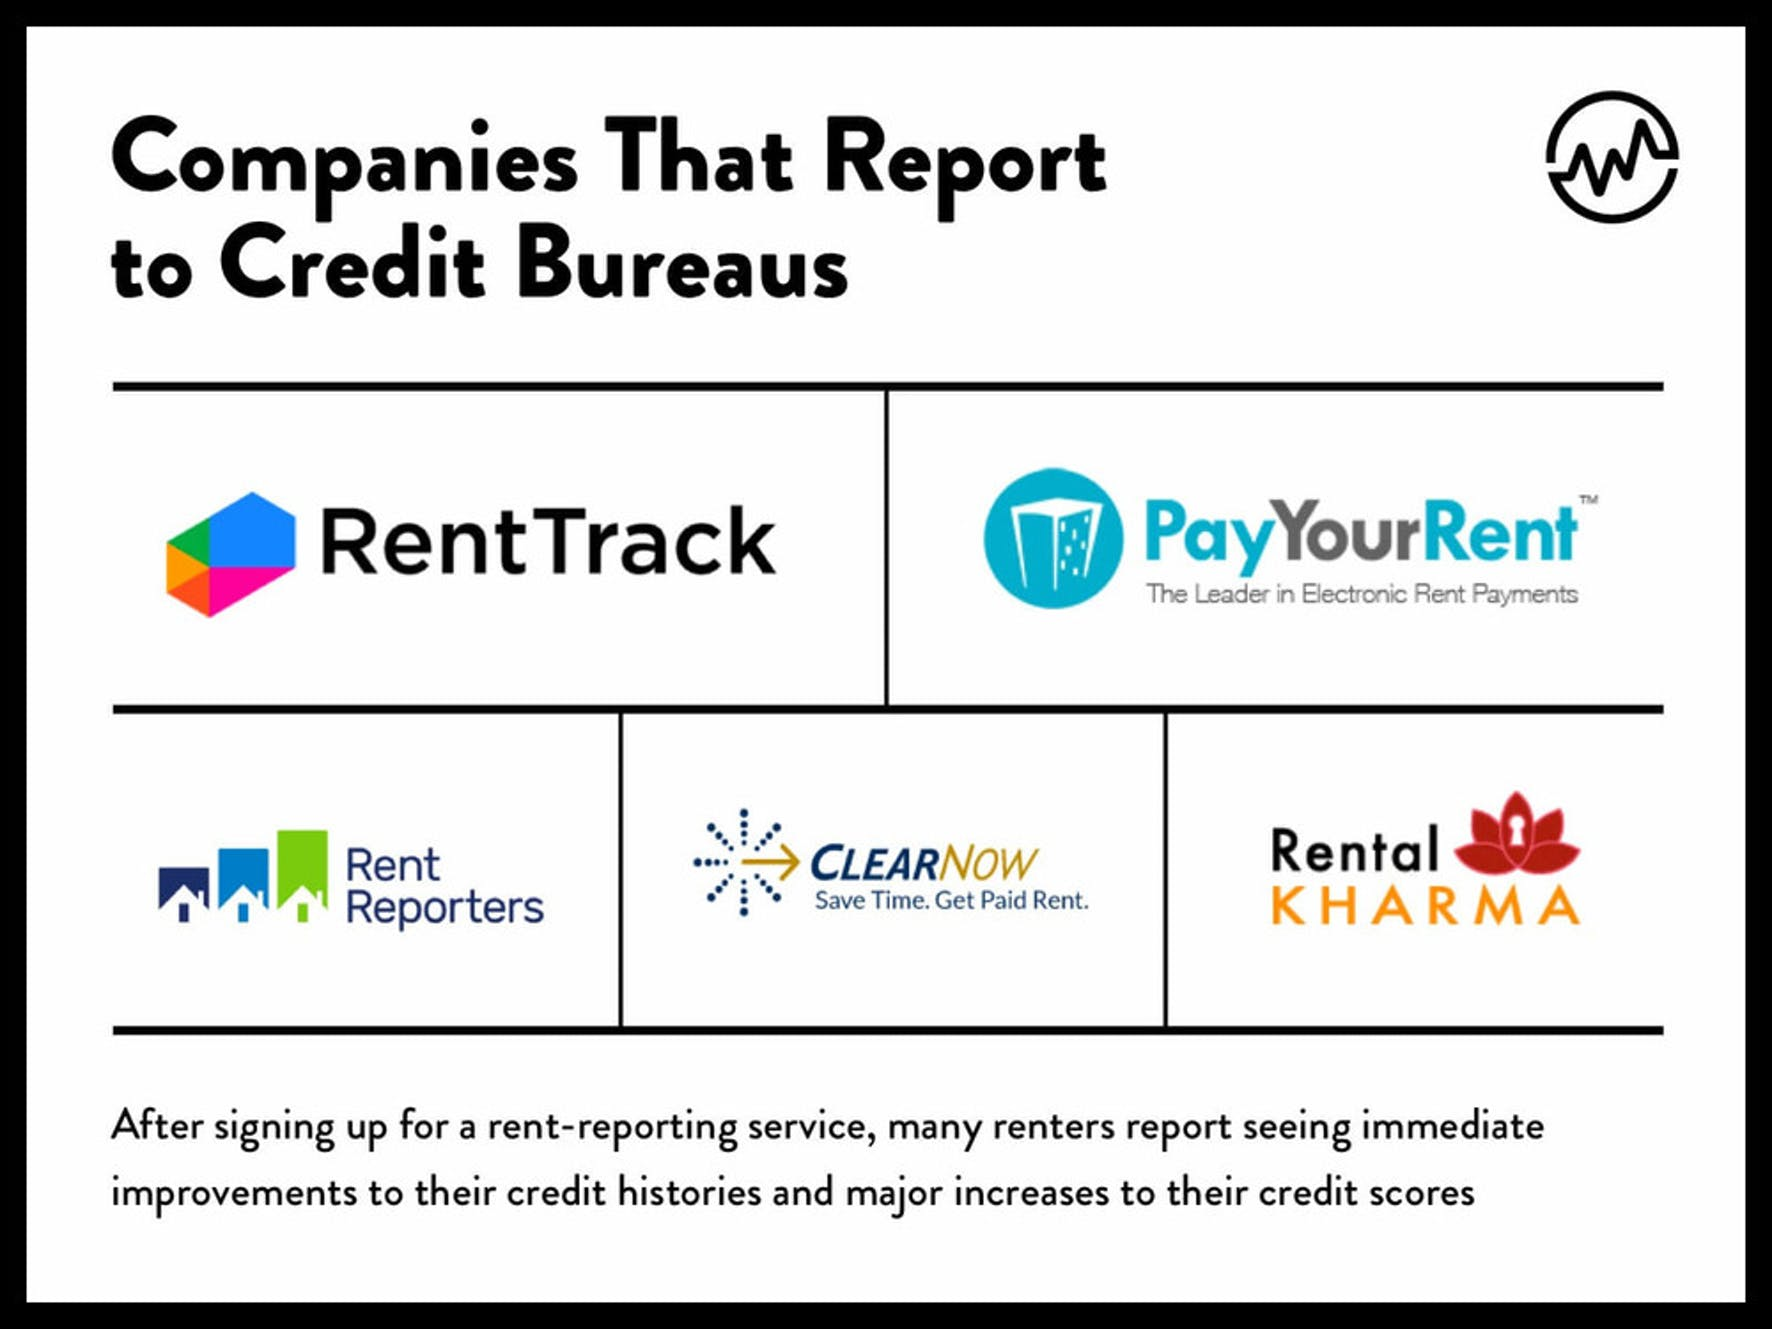 companies that report rent to credit bureaus